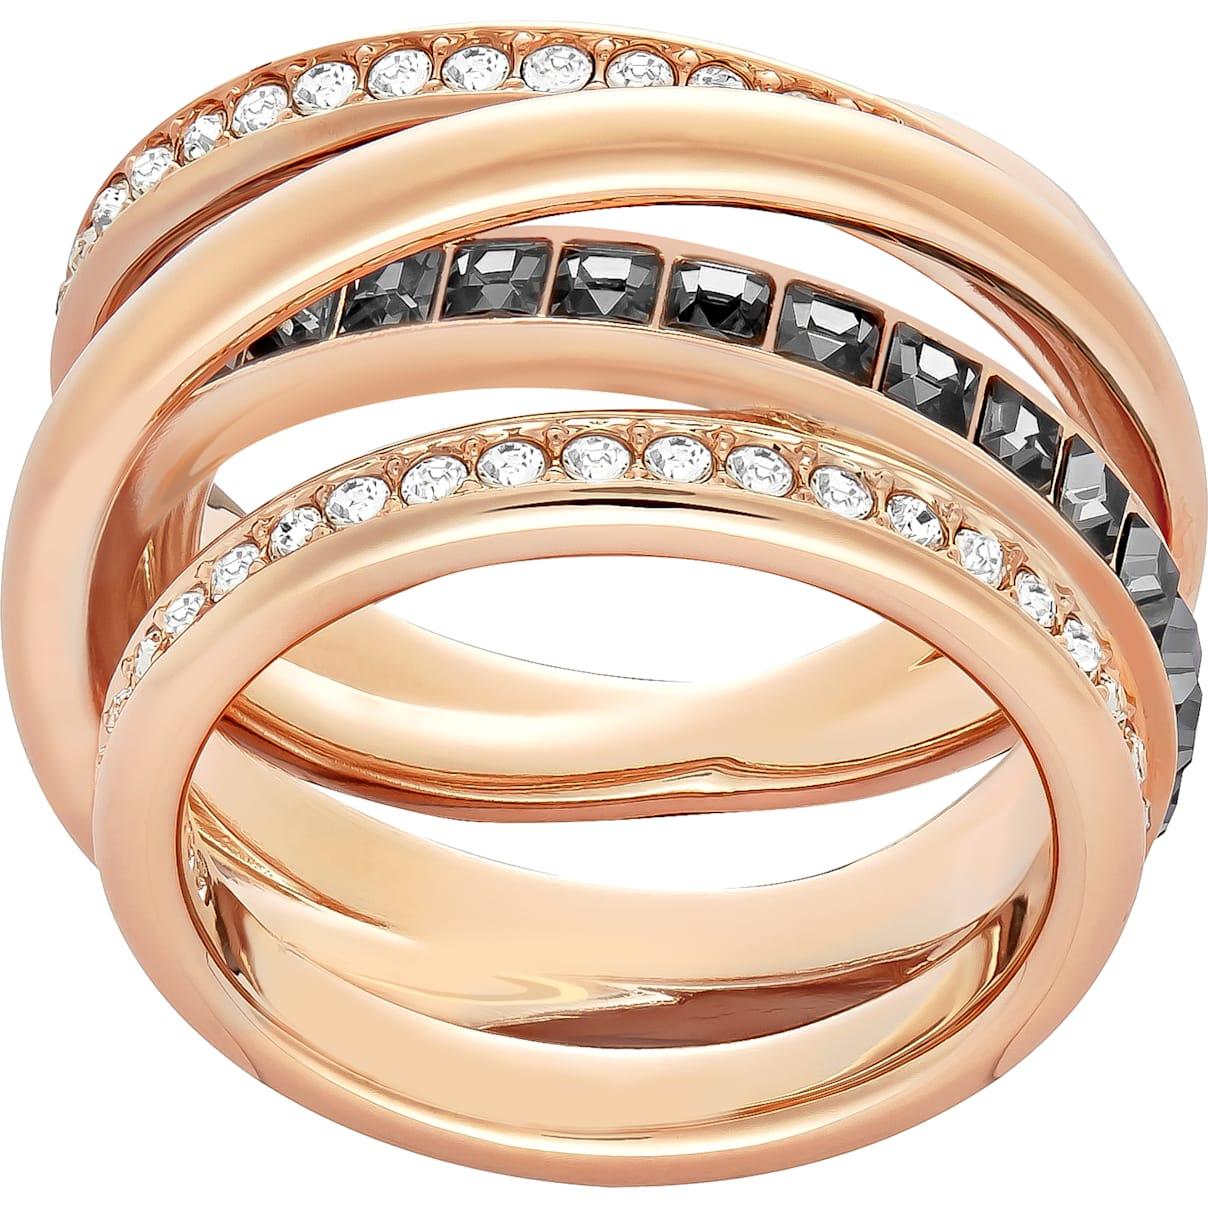 Swarovski Dynamic Ring, Gray, Rose-gold tone plated